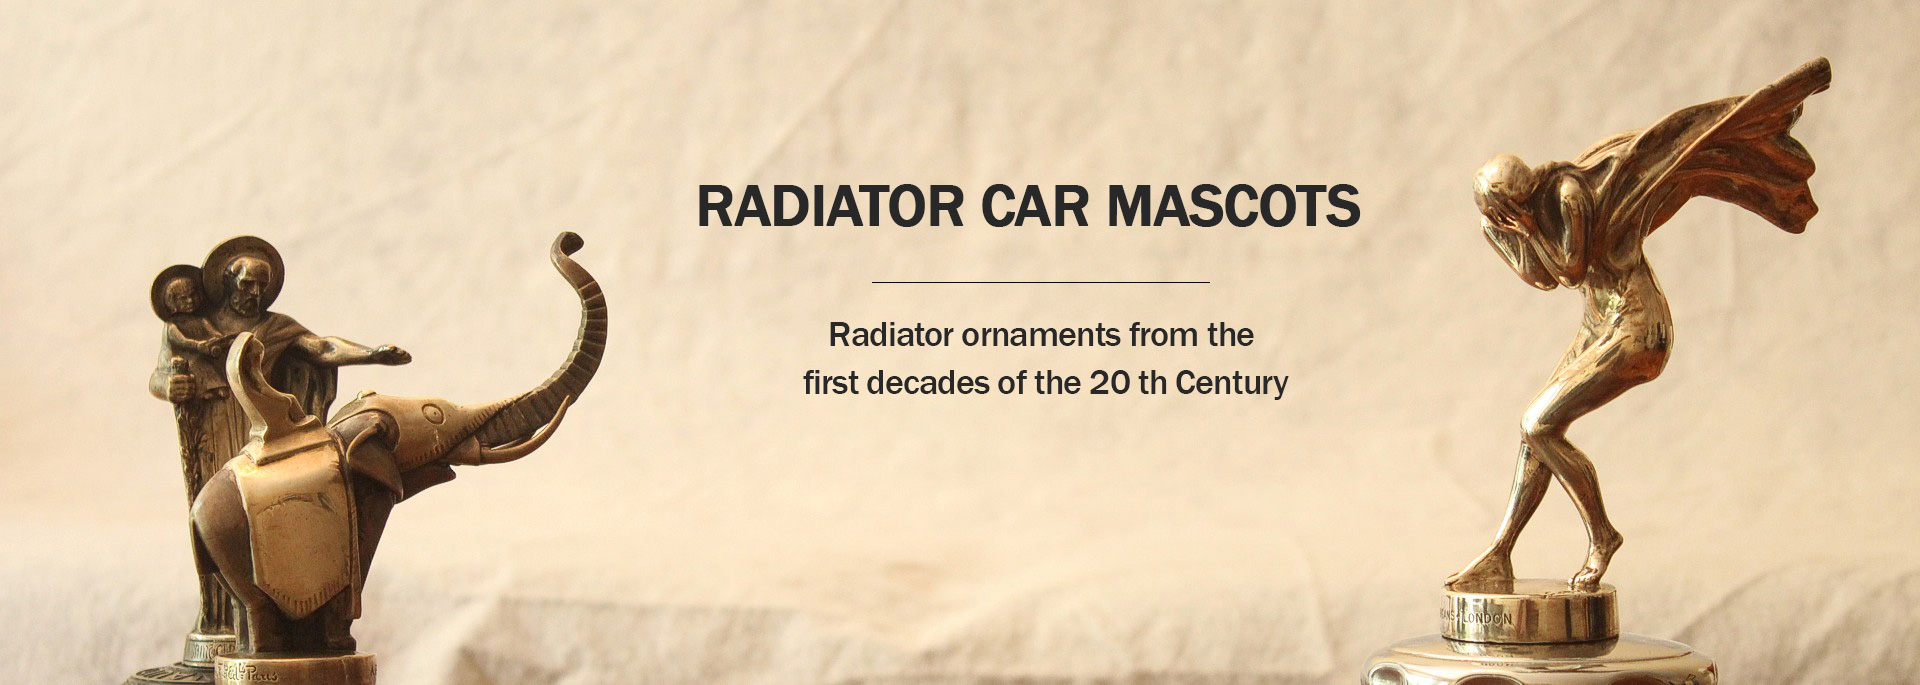 Radiator Car Mascots